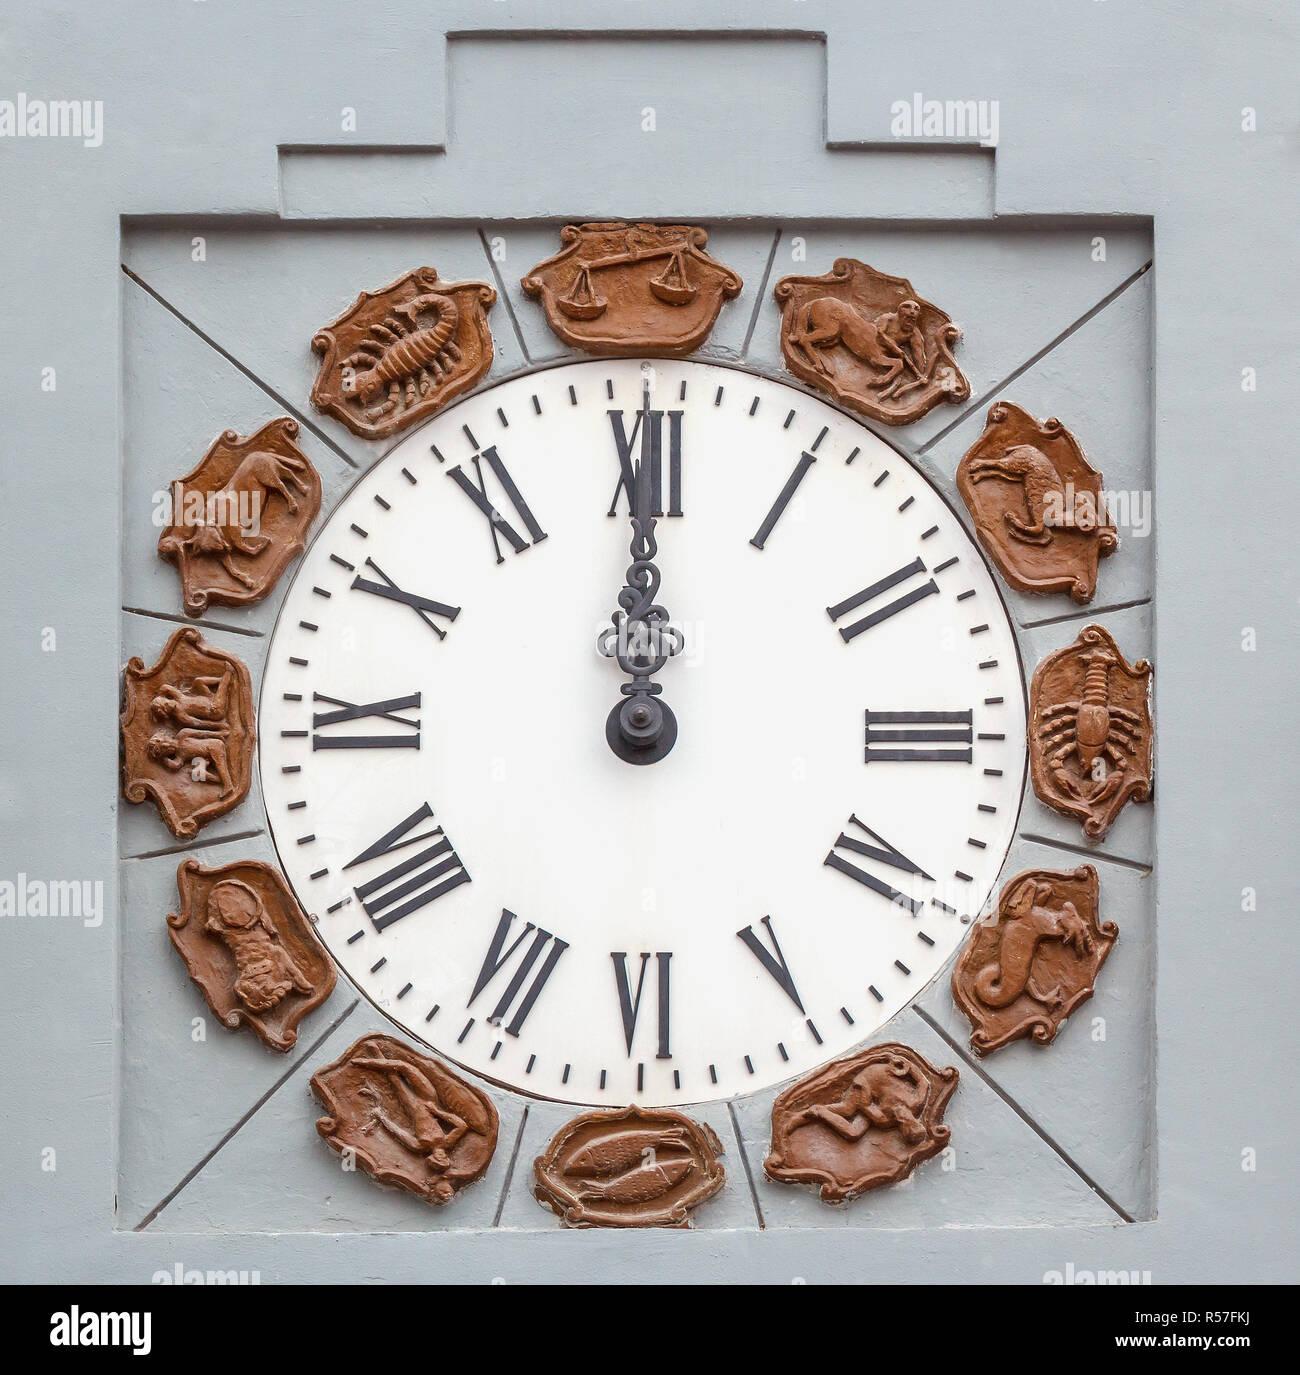 Twelve o'clock by  clock face - Stock Image